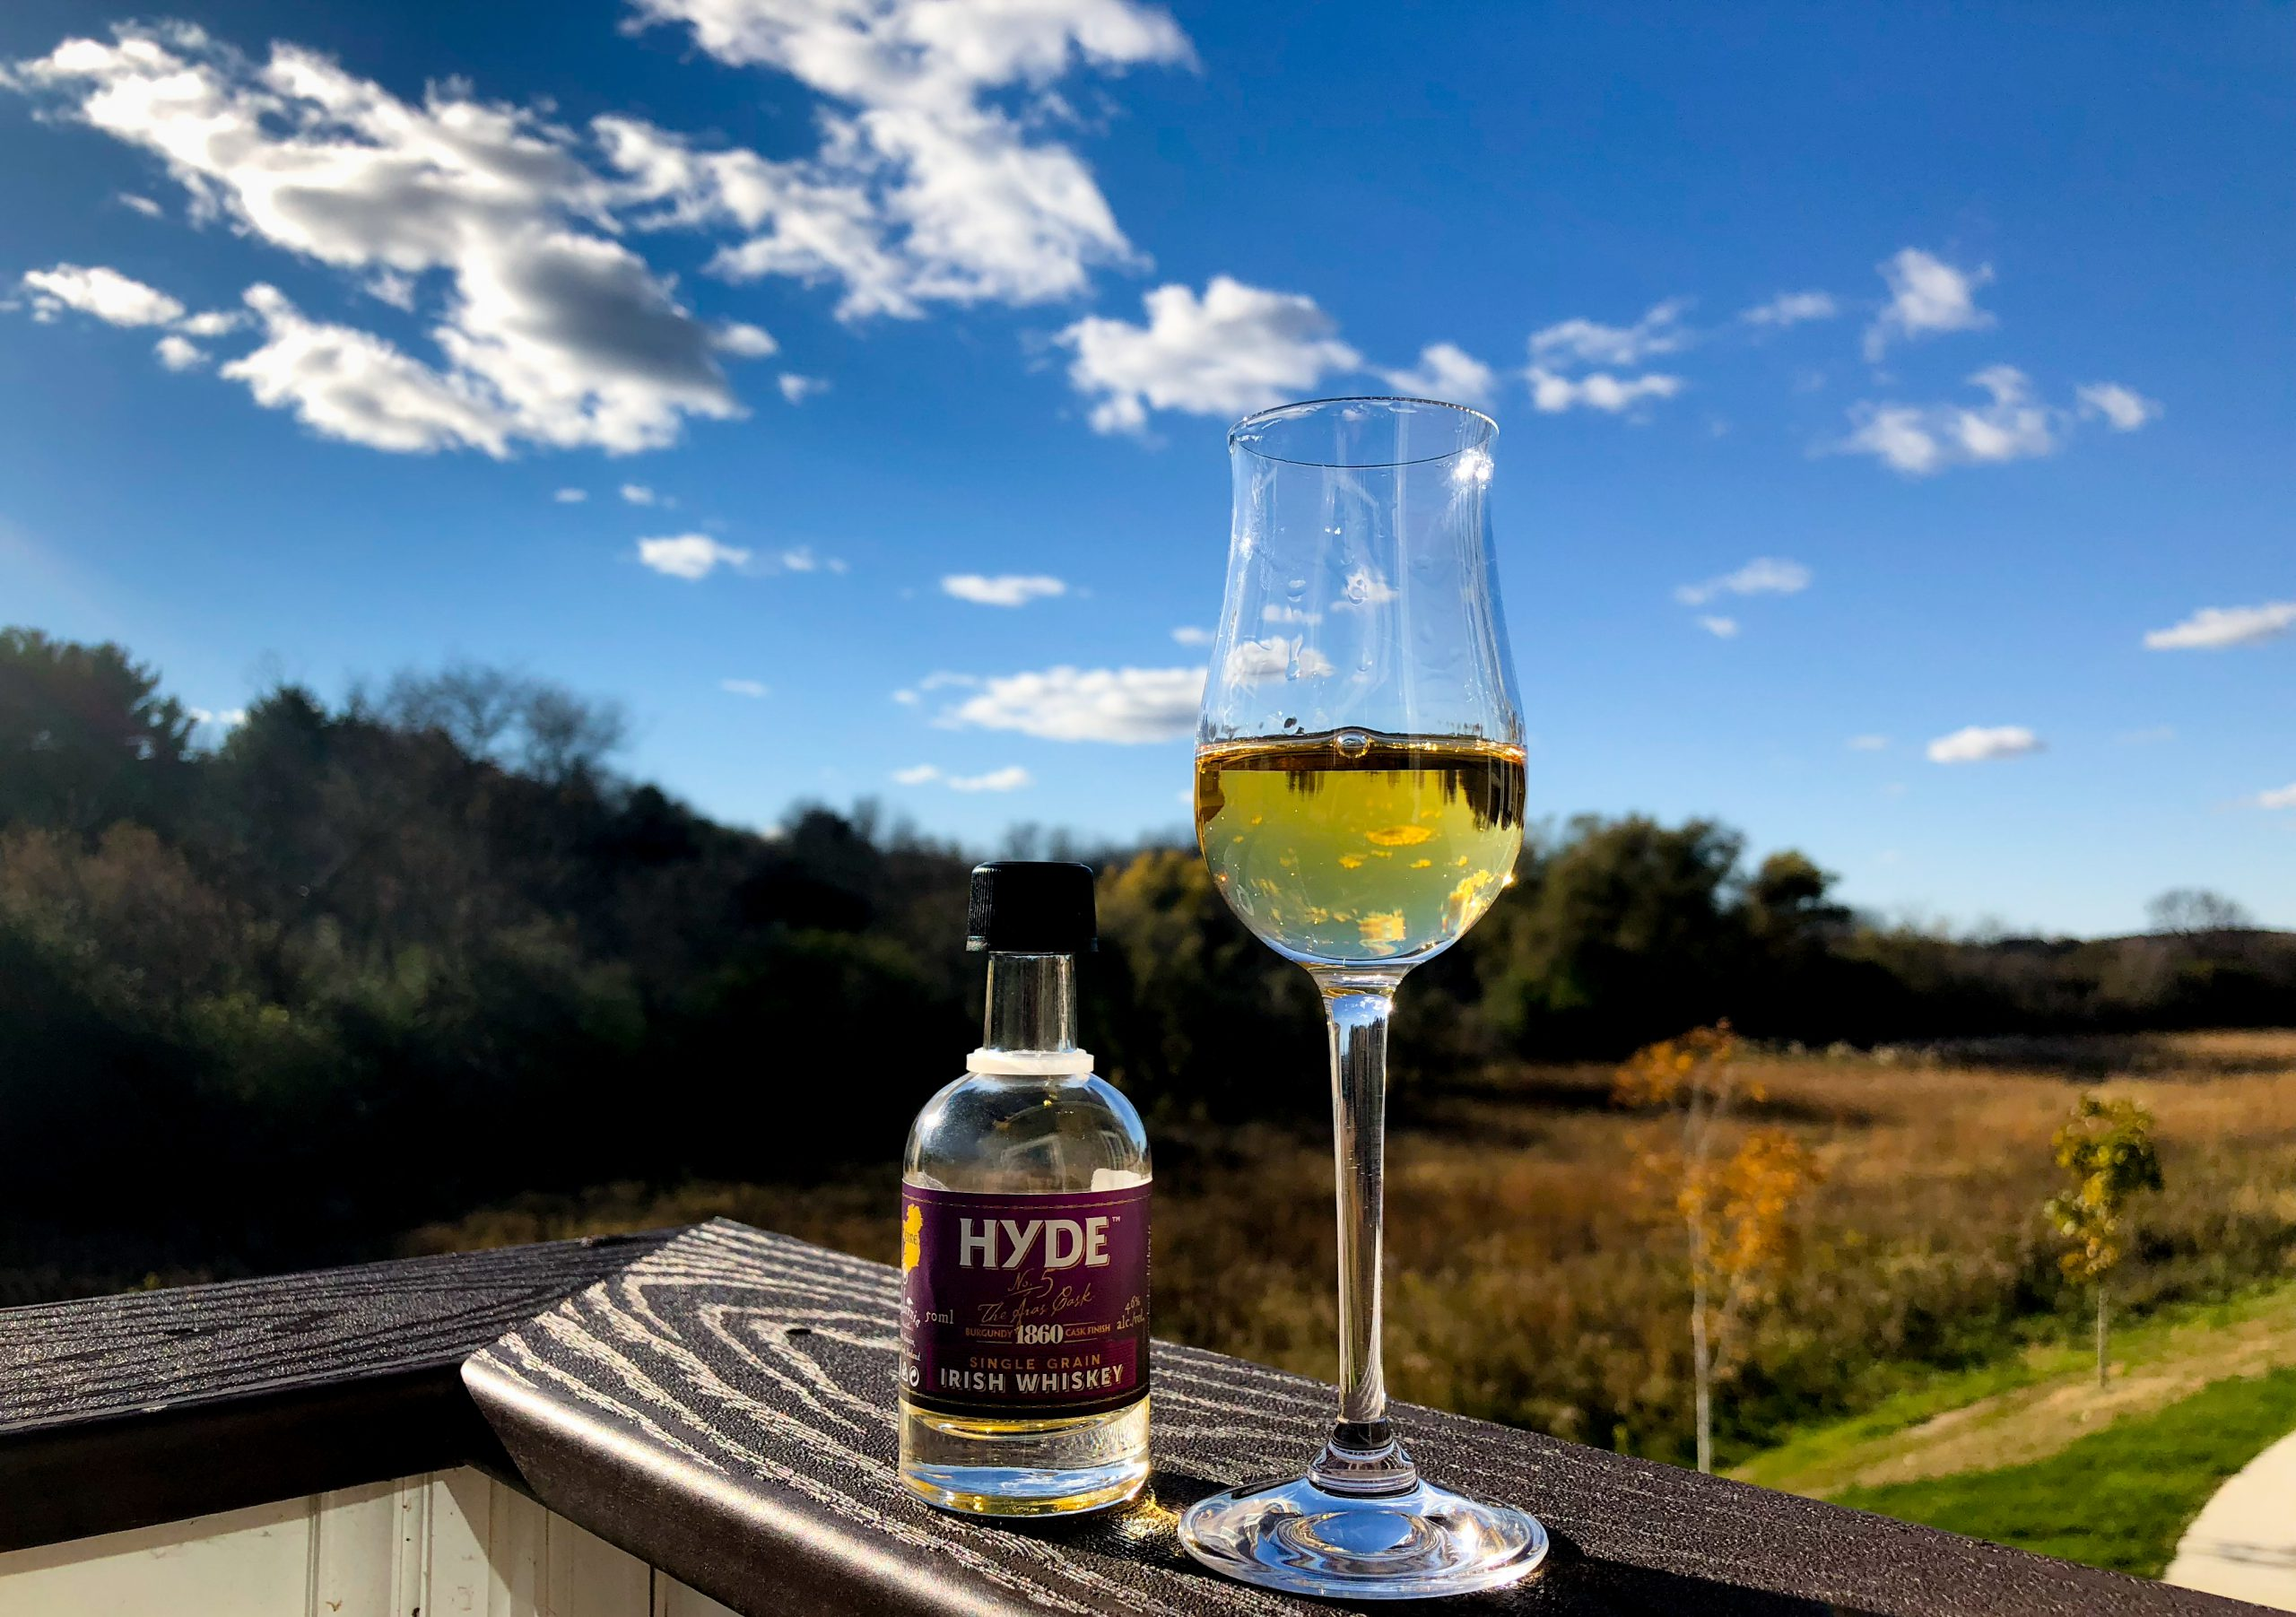 Hyde 1860 Burgundy Cask Irish Whiskey